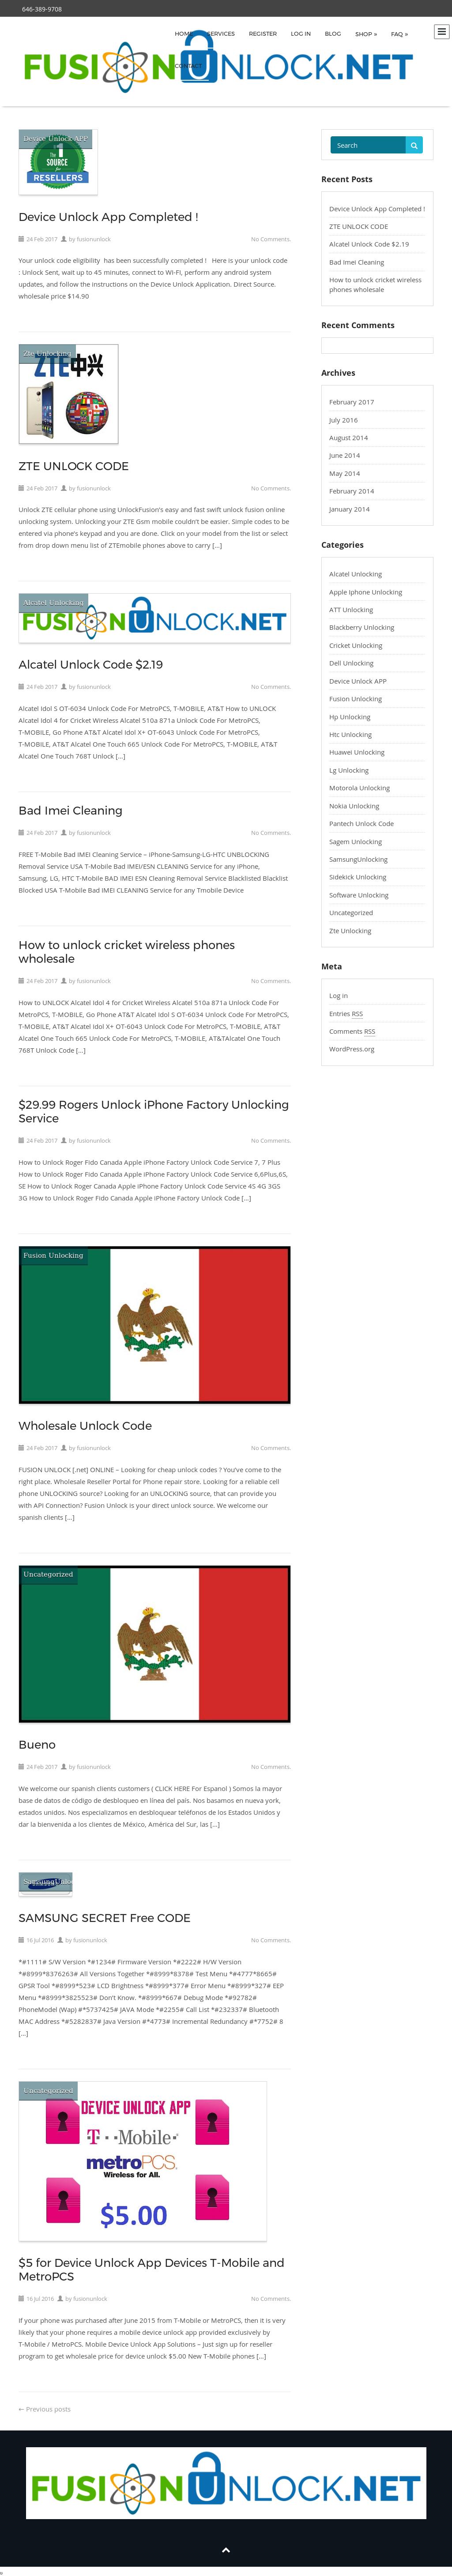 Fusionunlock Competitors, Revenue and Employees - Owler Company Profile